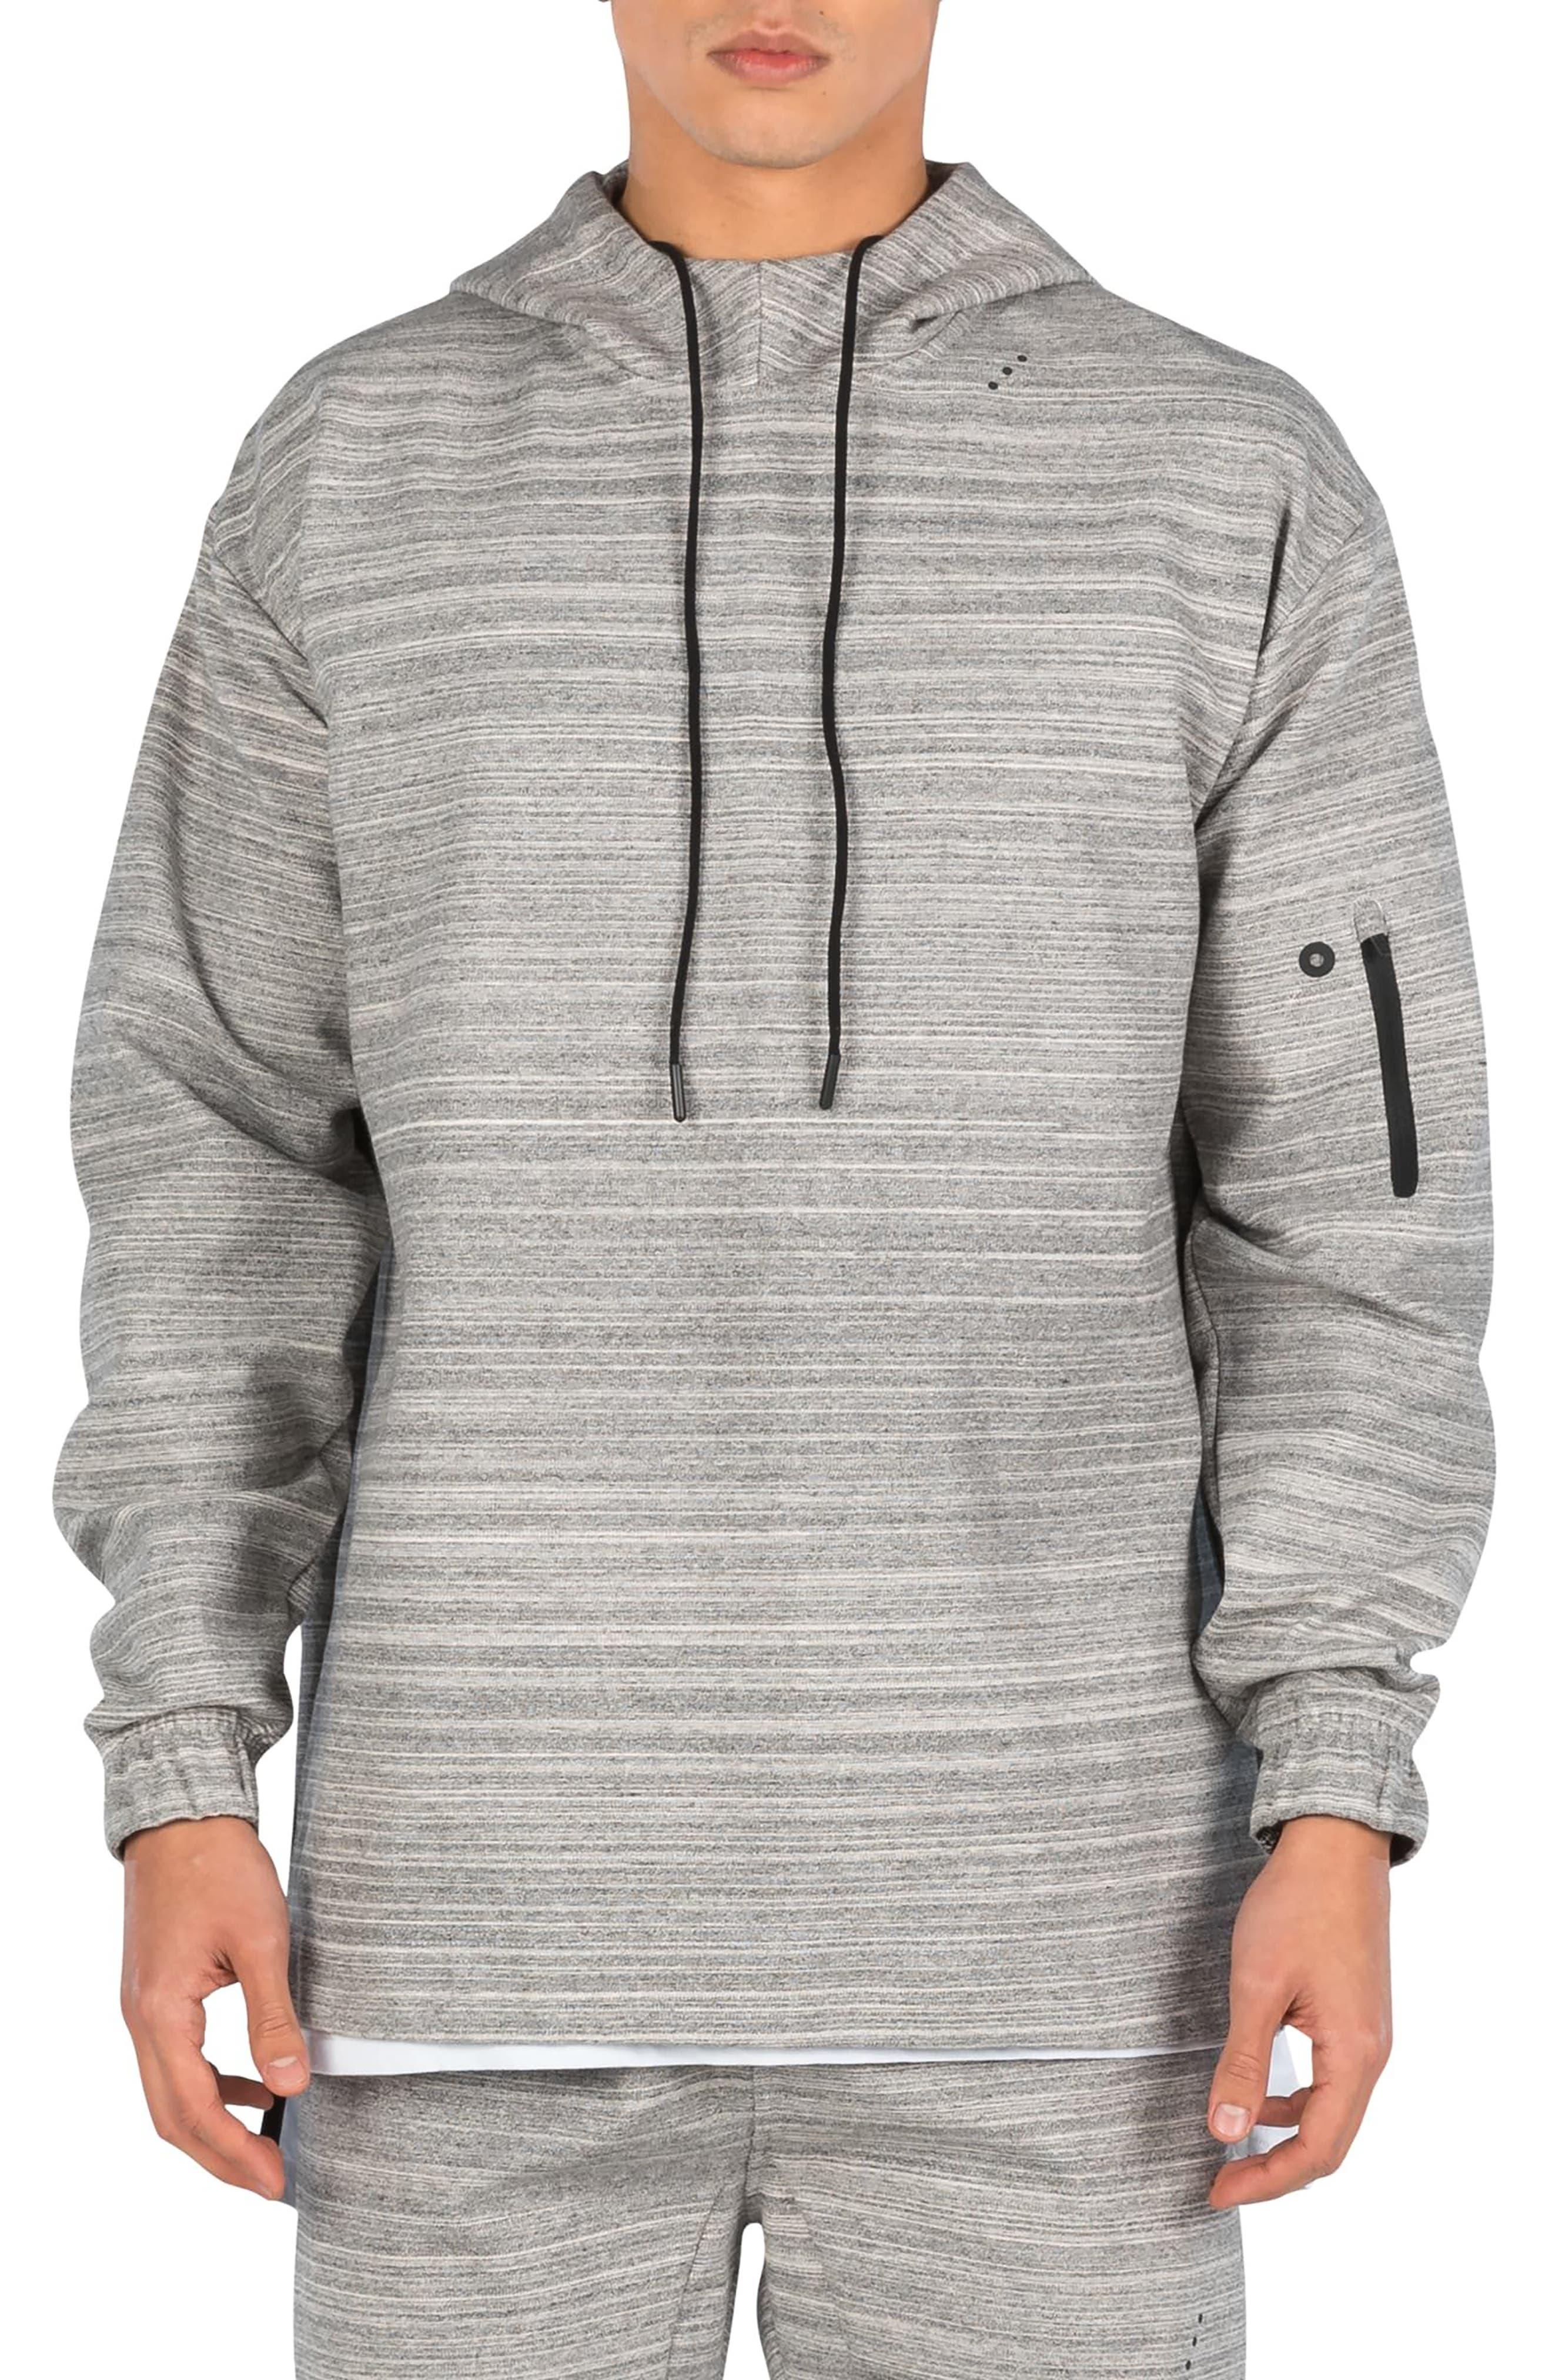 Tech Hoodie Sweatshirt,                             Main thumbnail 1, color,                             031